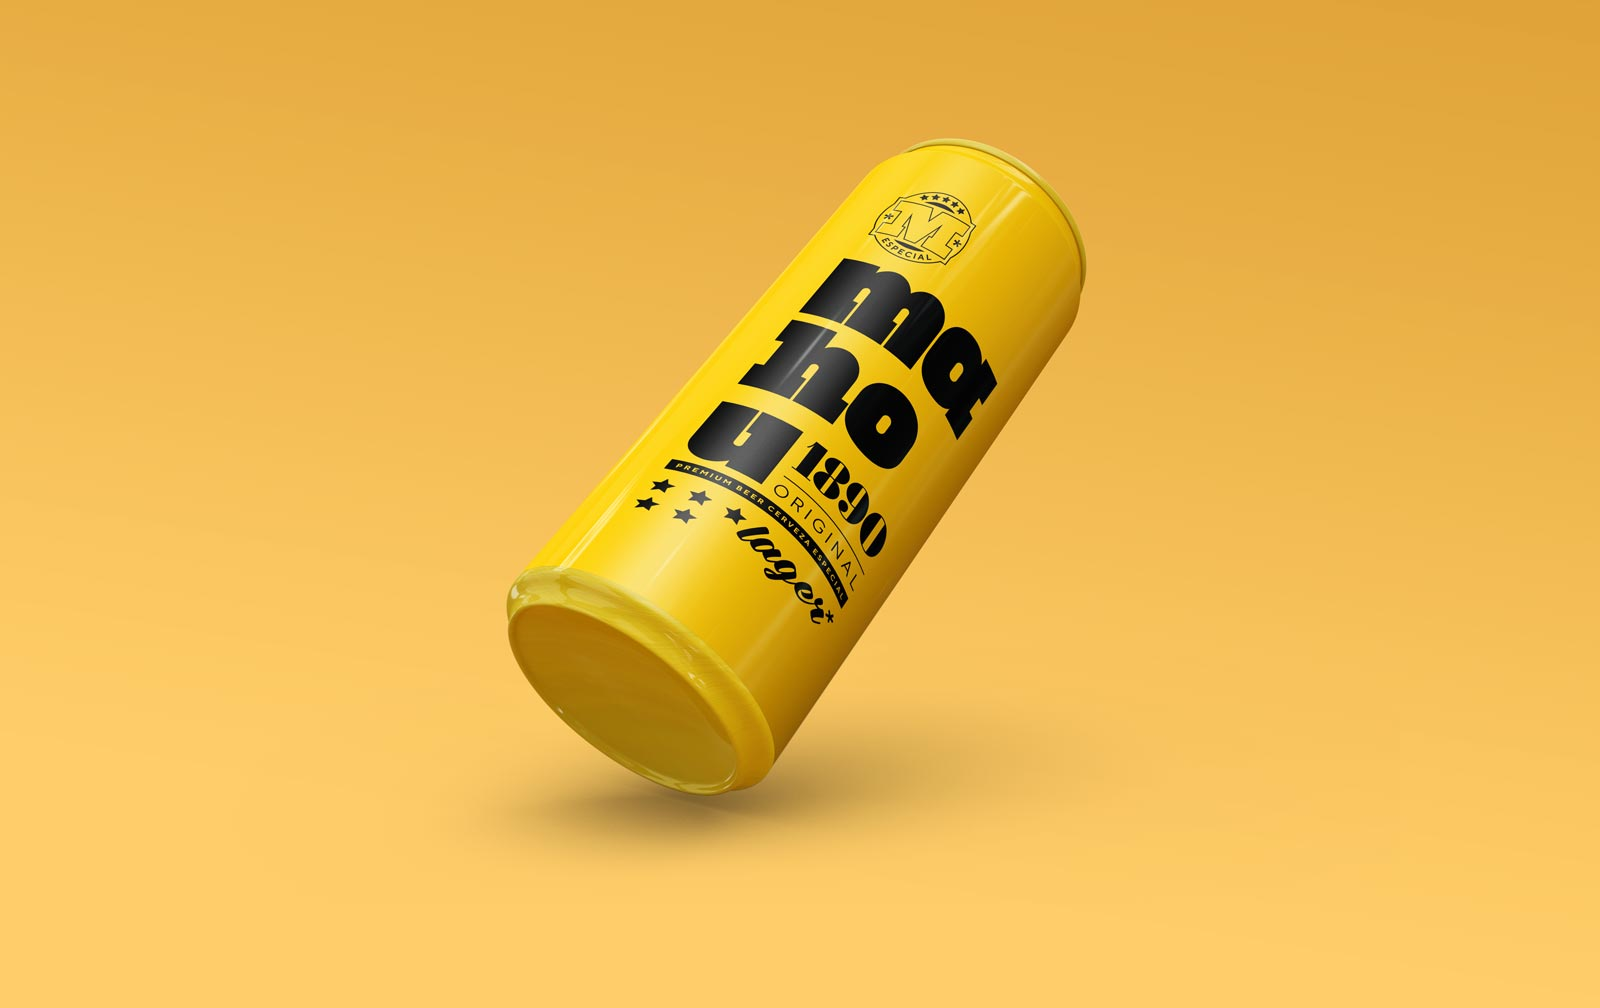 Mahou-Packaging-05